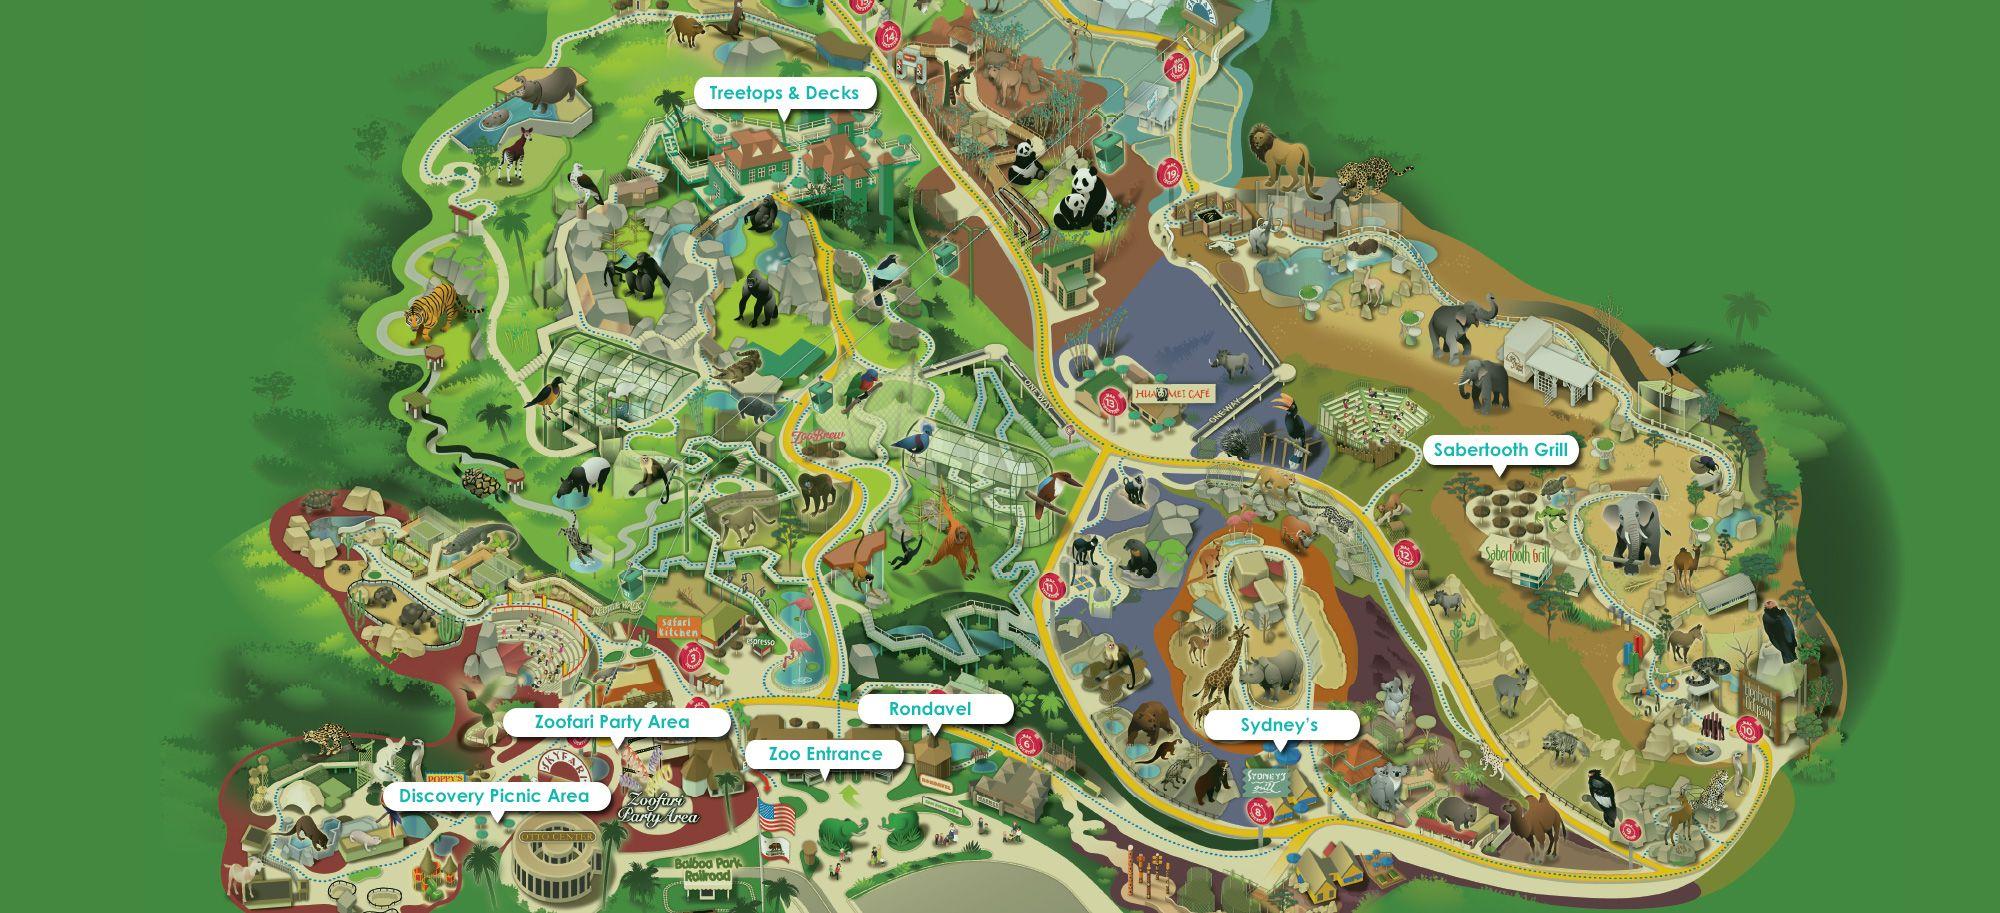 san diego zoo venues san diego zoo safari park events maps